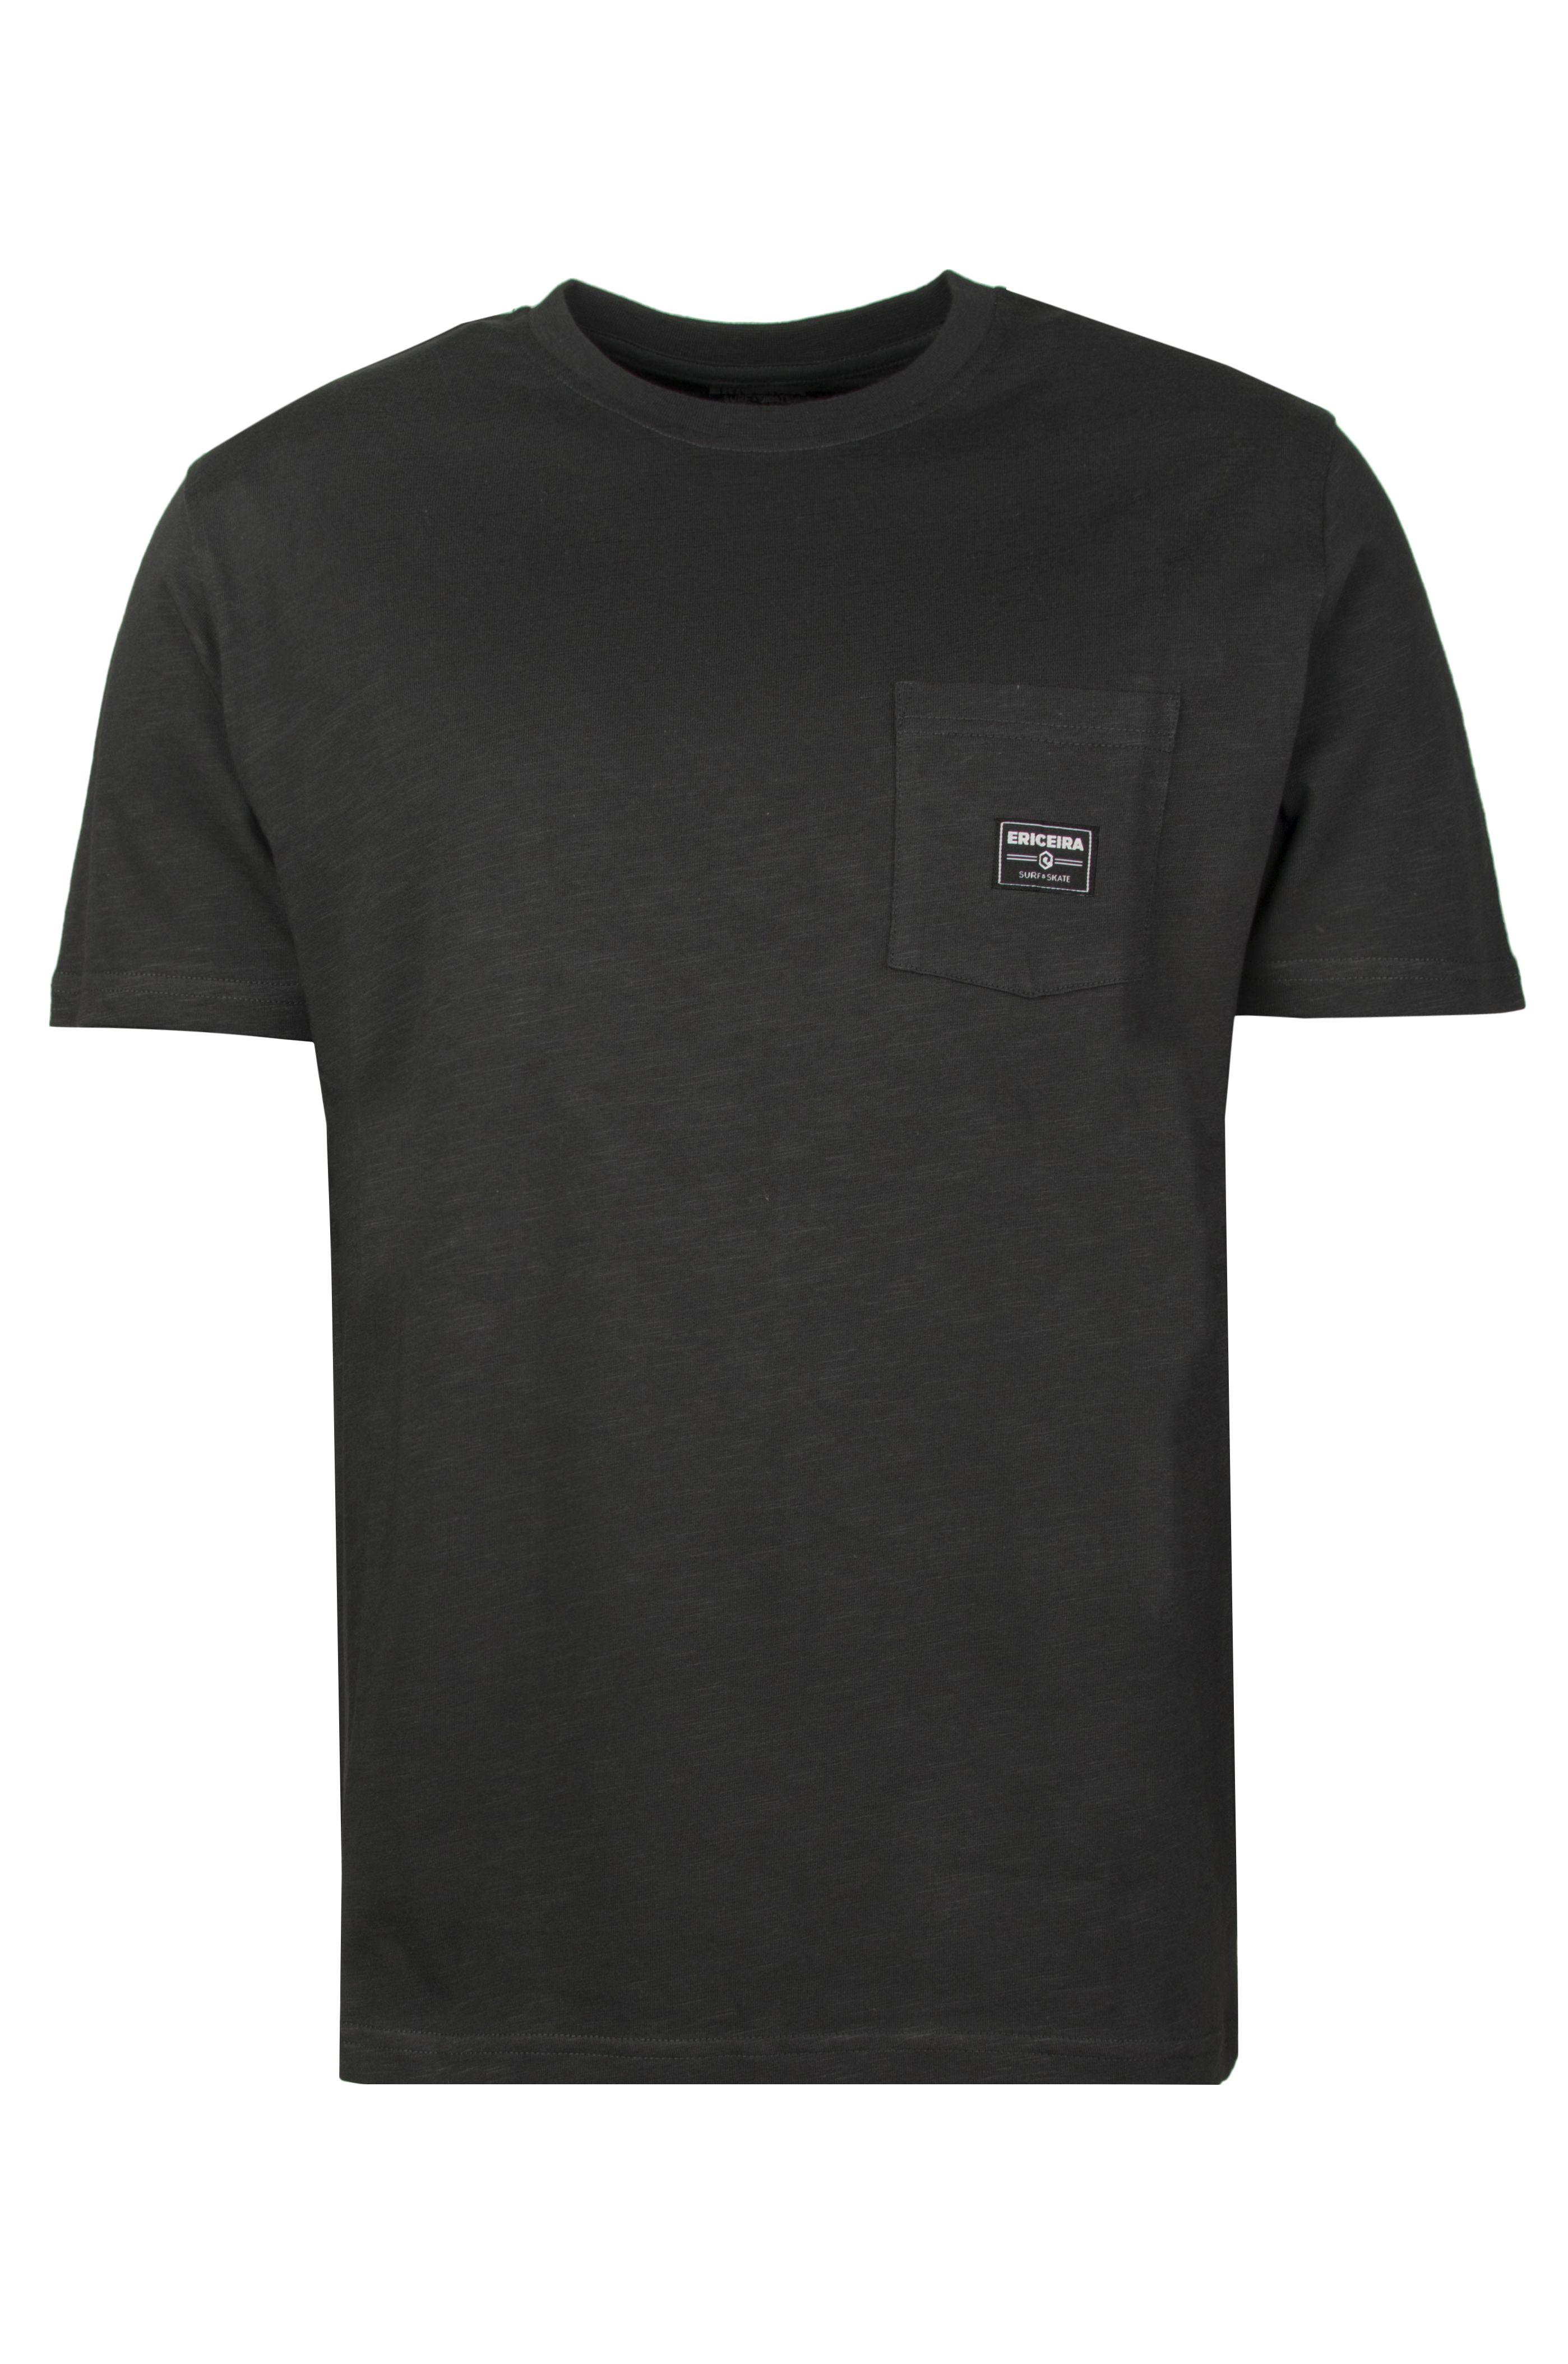 T-Shirt Ericeira Surf Skate LOGO Charcoal